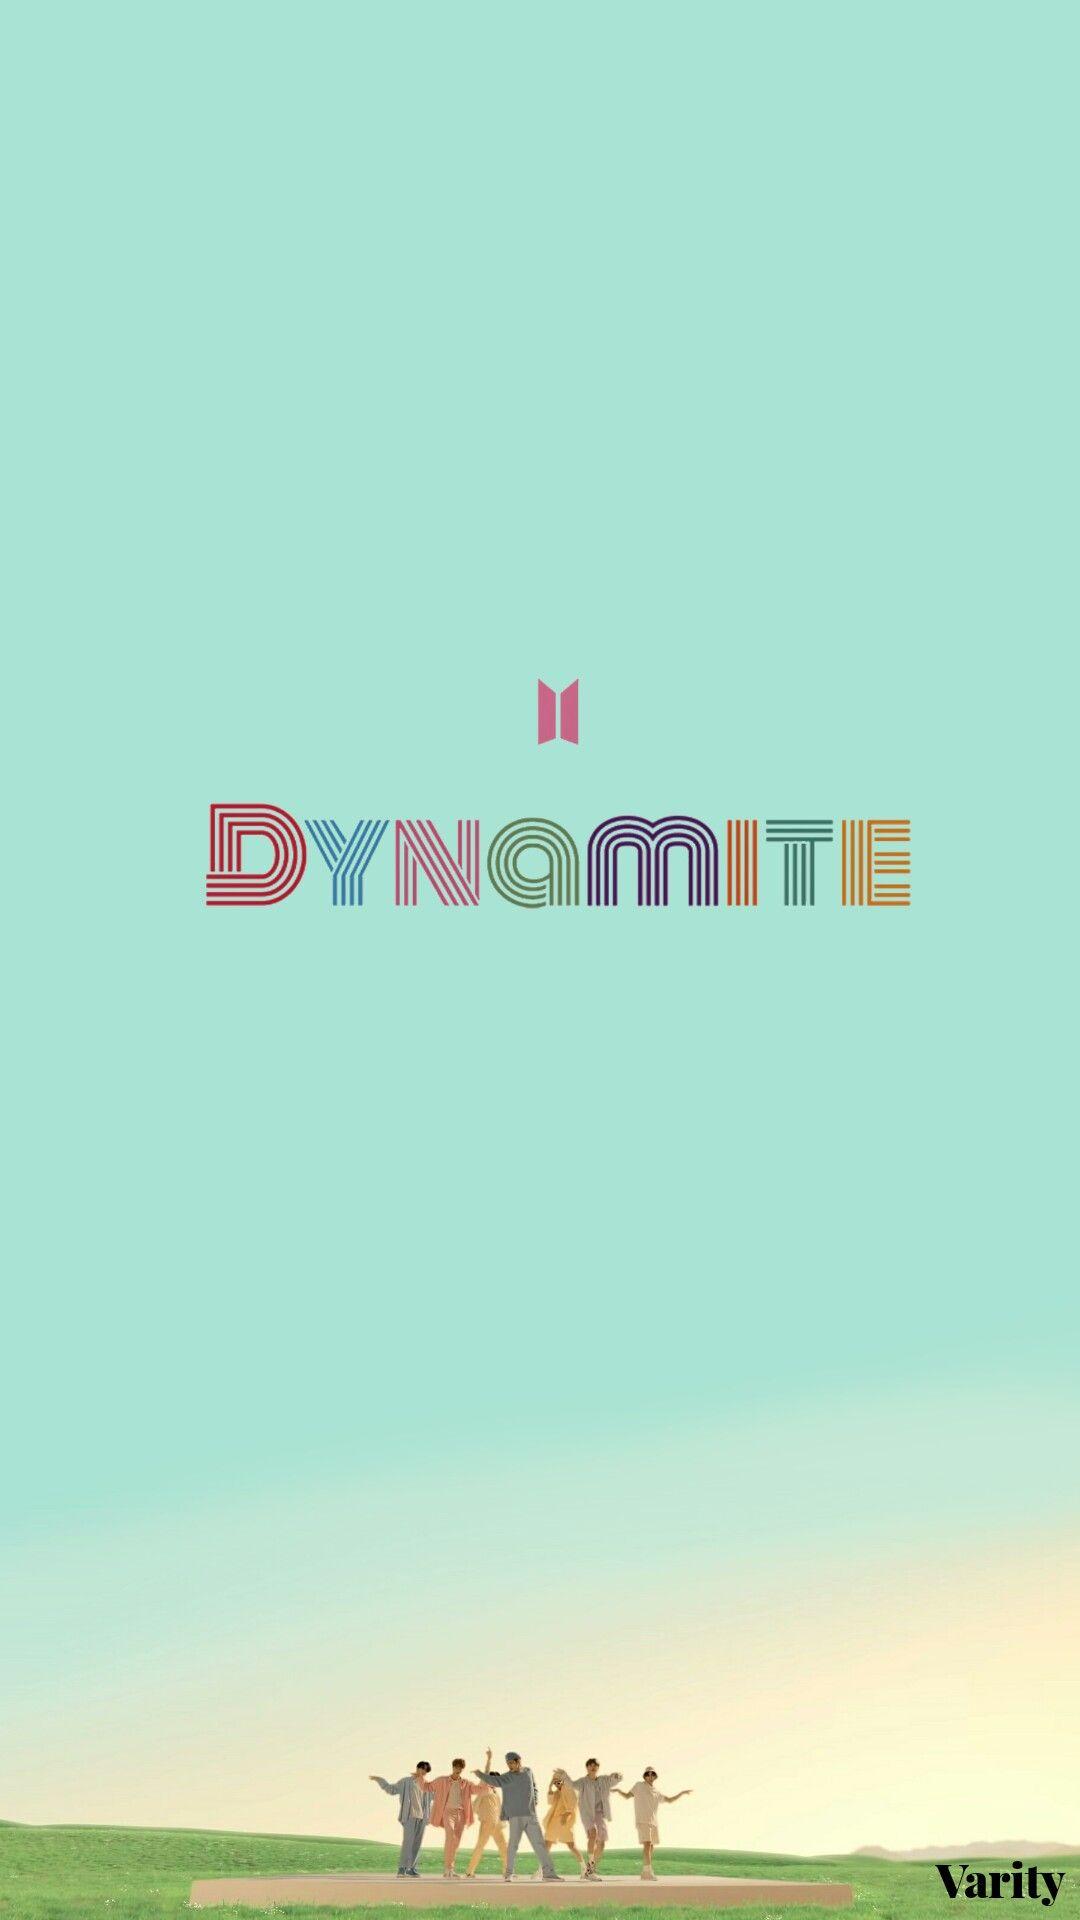 Dynamite Aesthetic Wallpaper Lockscreen In 2021 Bts Wallpaper Lyrics Bts Wallpaper Album Bts Bts dynamite logo wallpaper